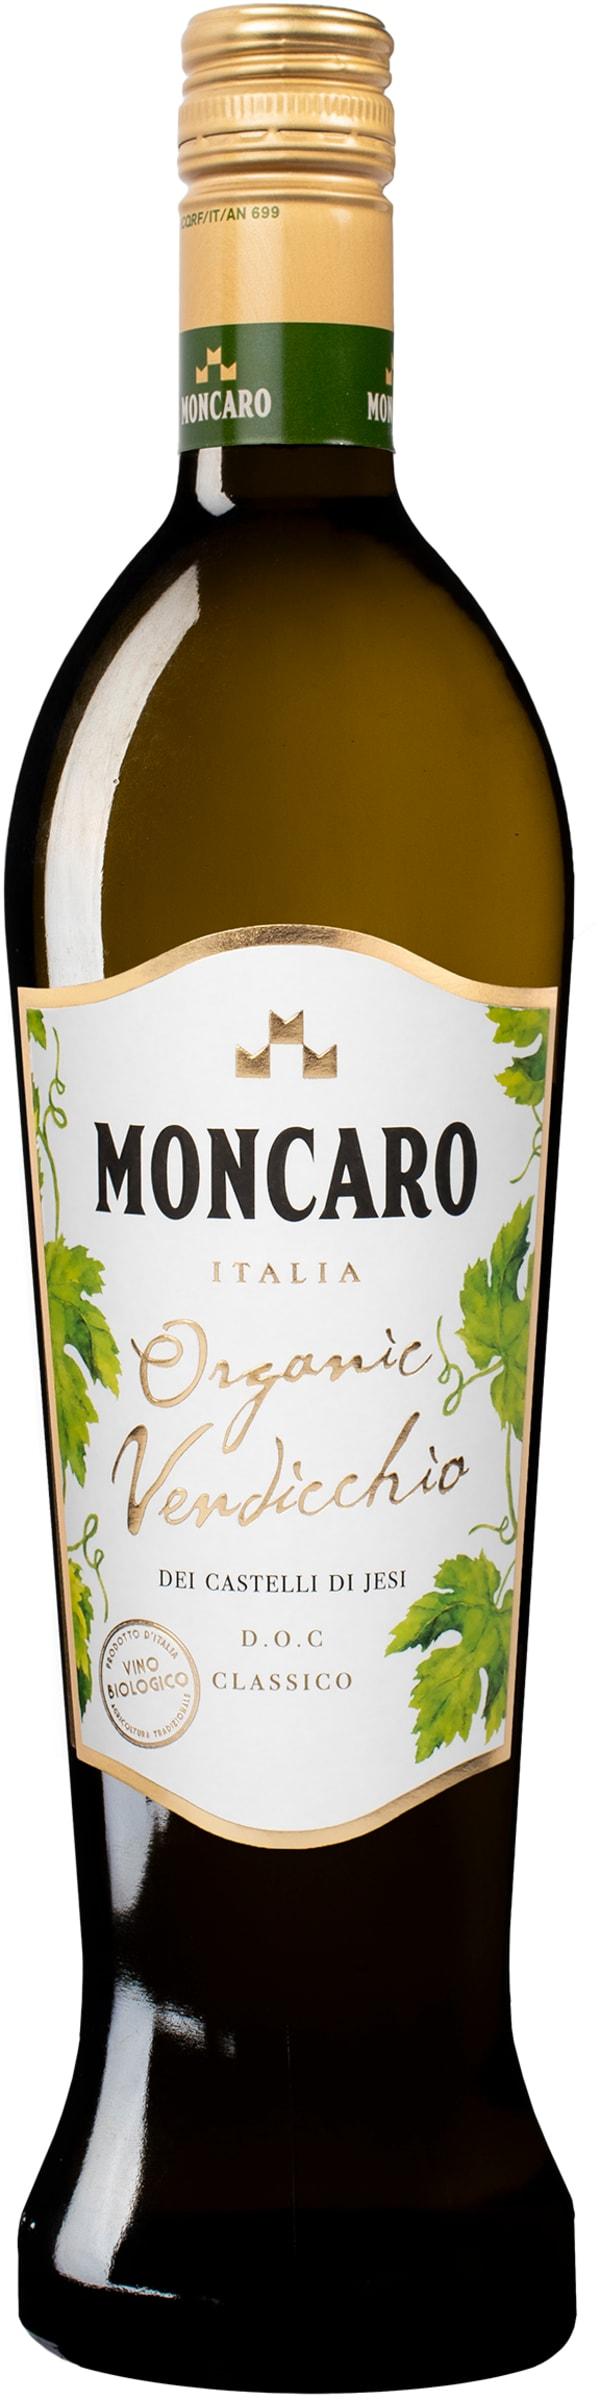 Moncaro Verdicchio dei Castelli di Jesi Classico Organic 2019